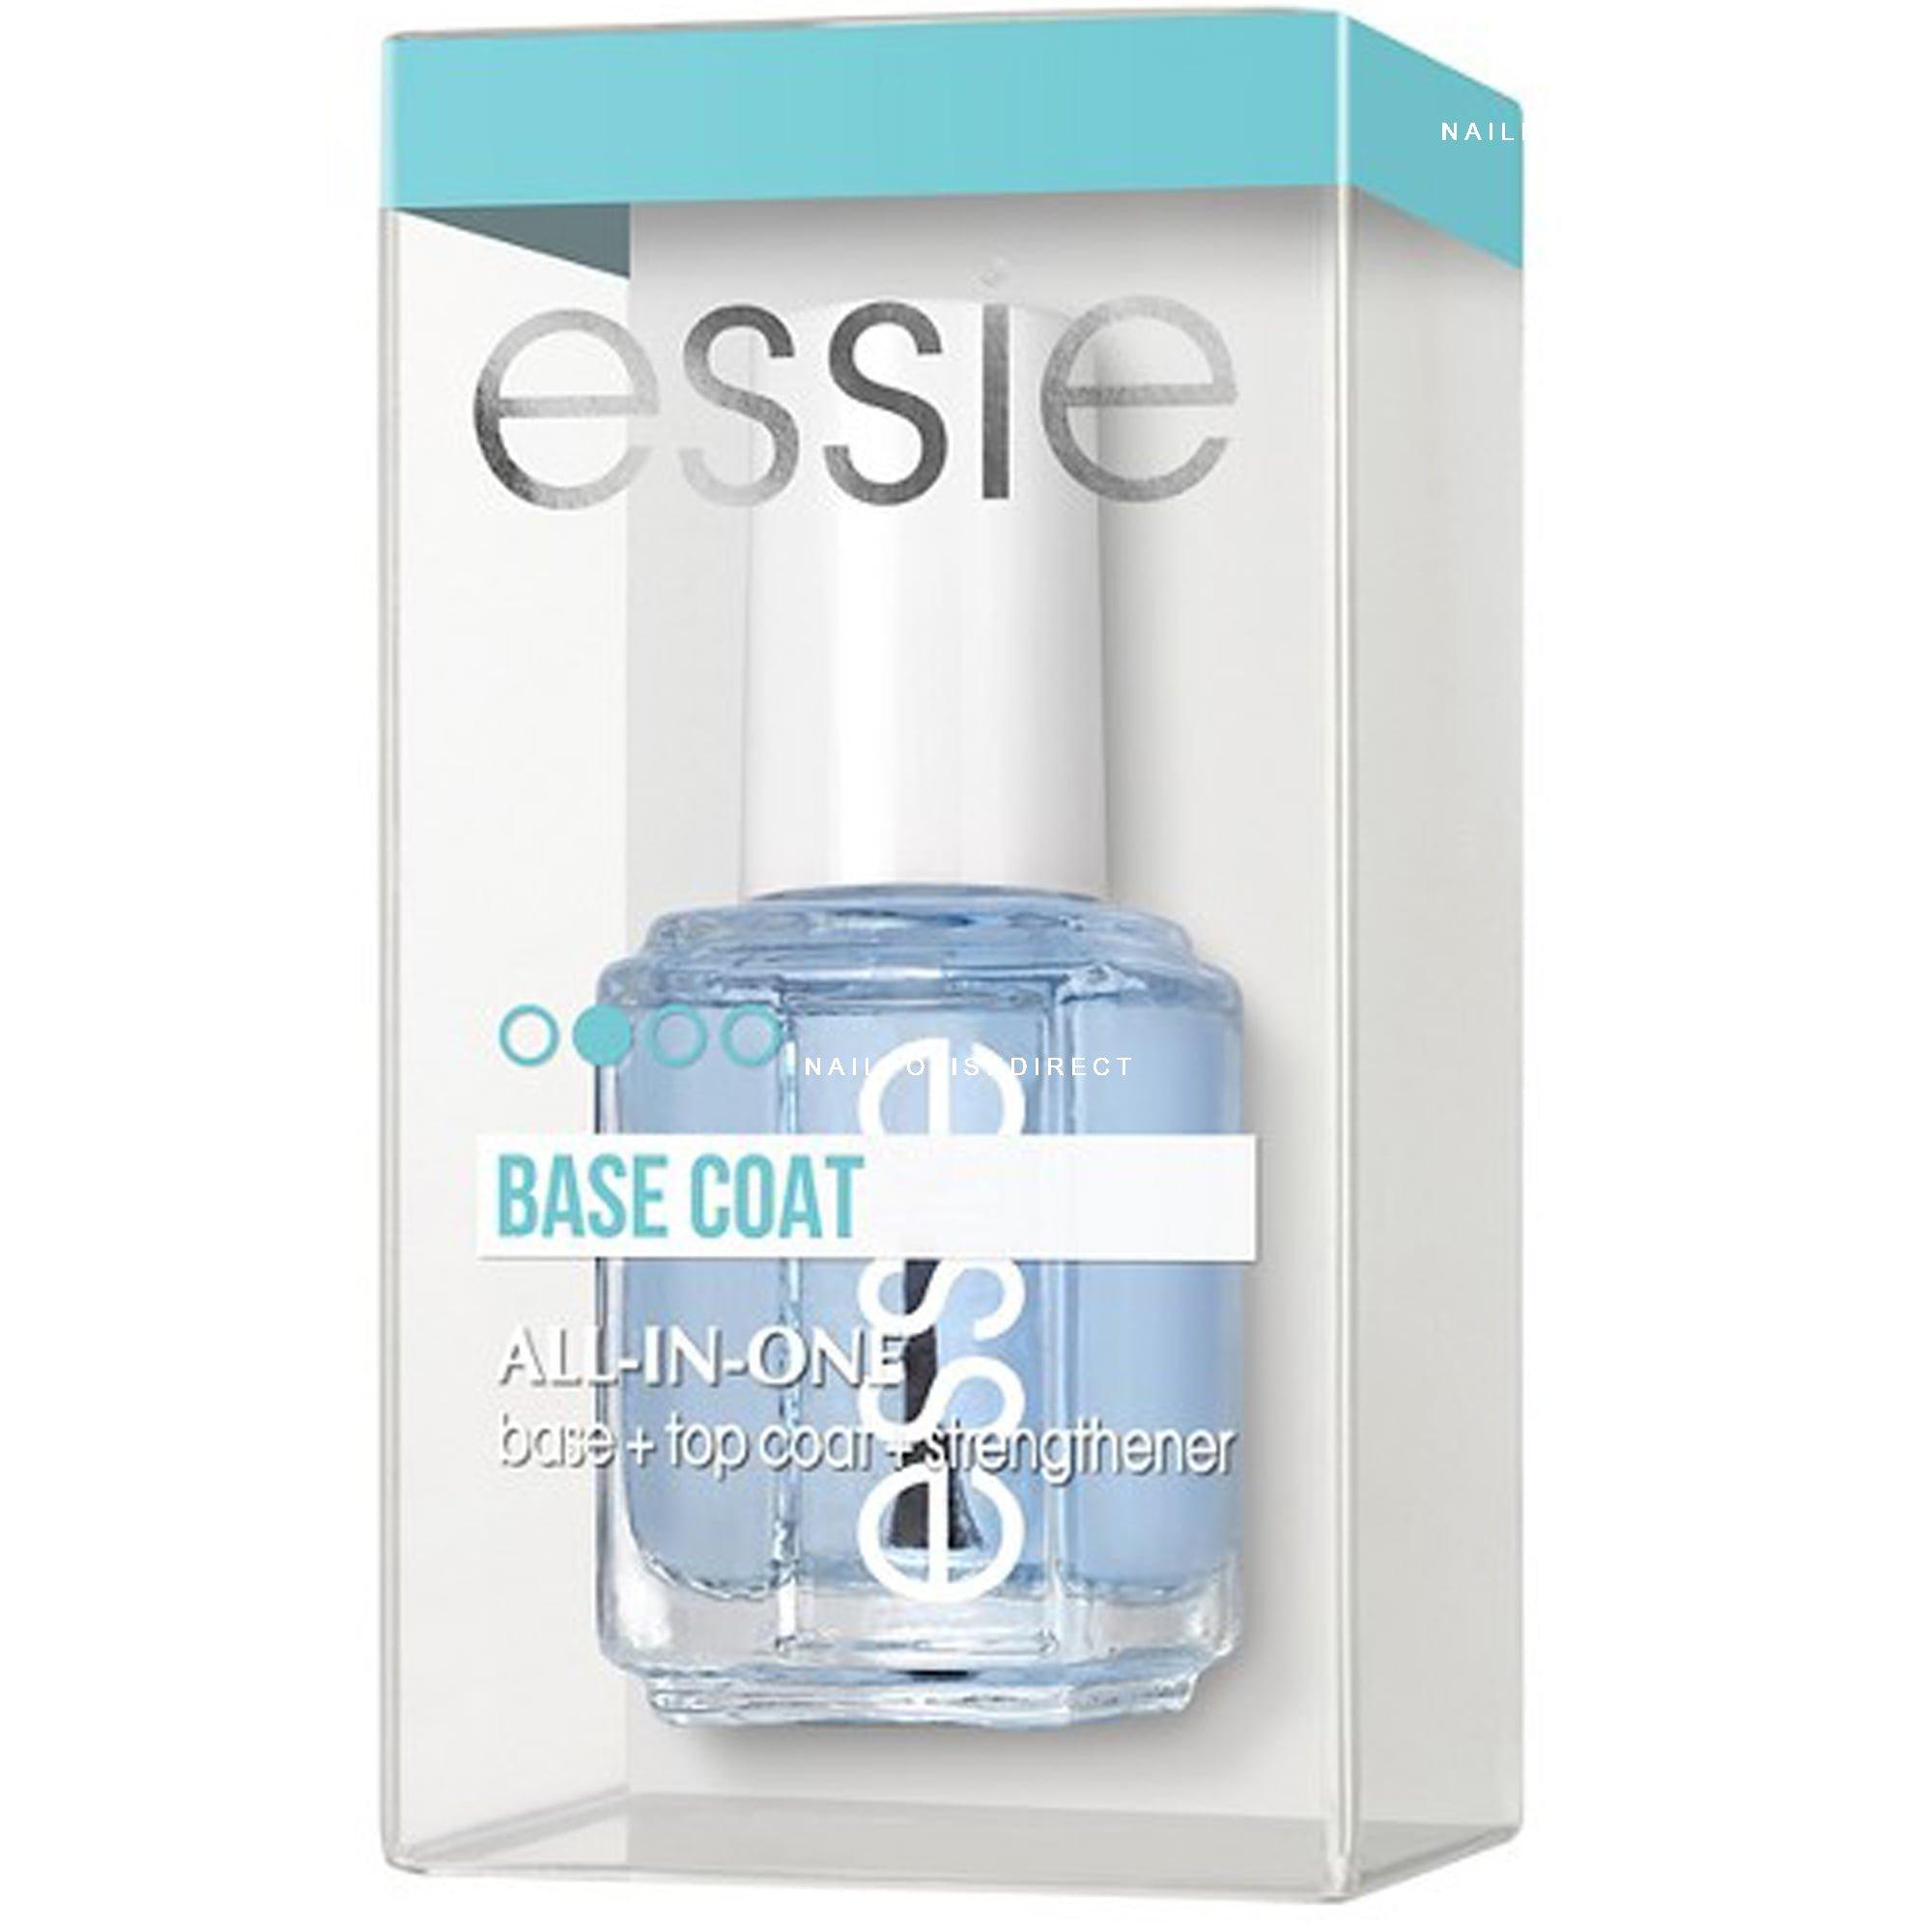 Essie Nail Polish 3 Way Glaze Treatment - All In One 13.5ml